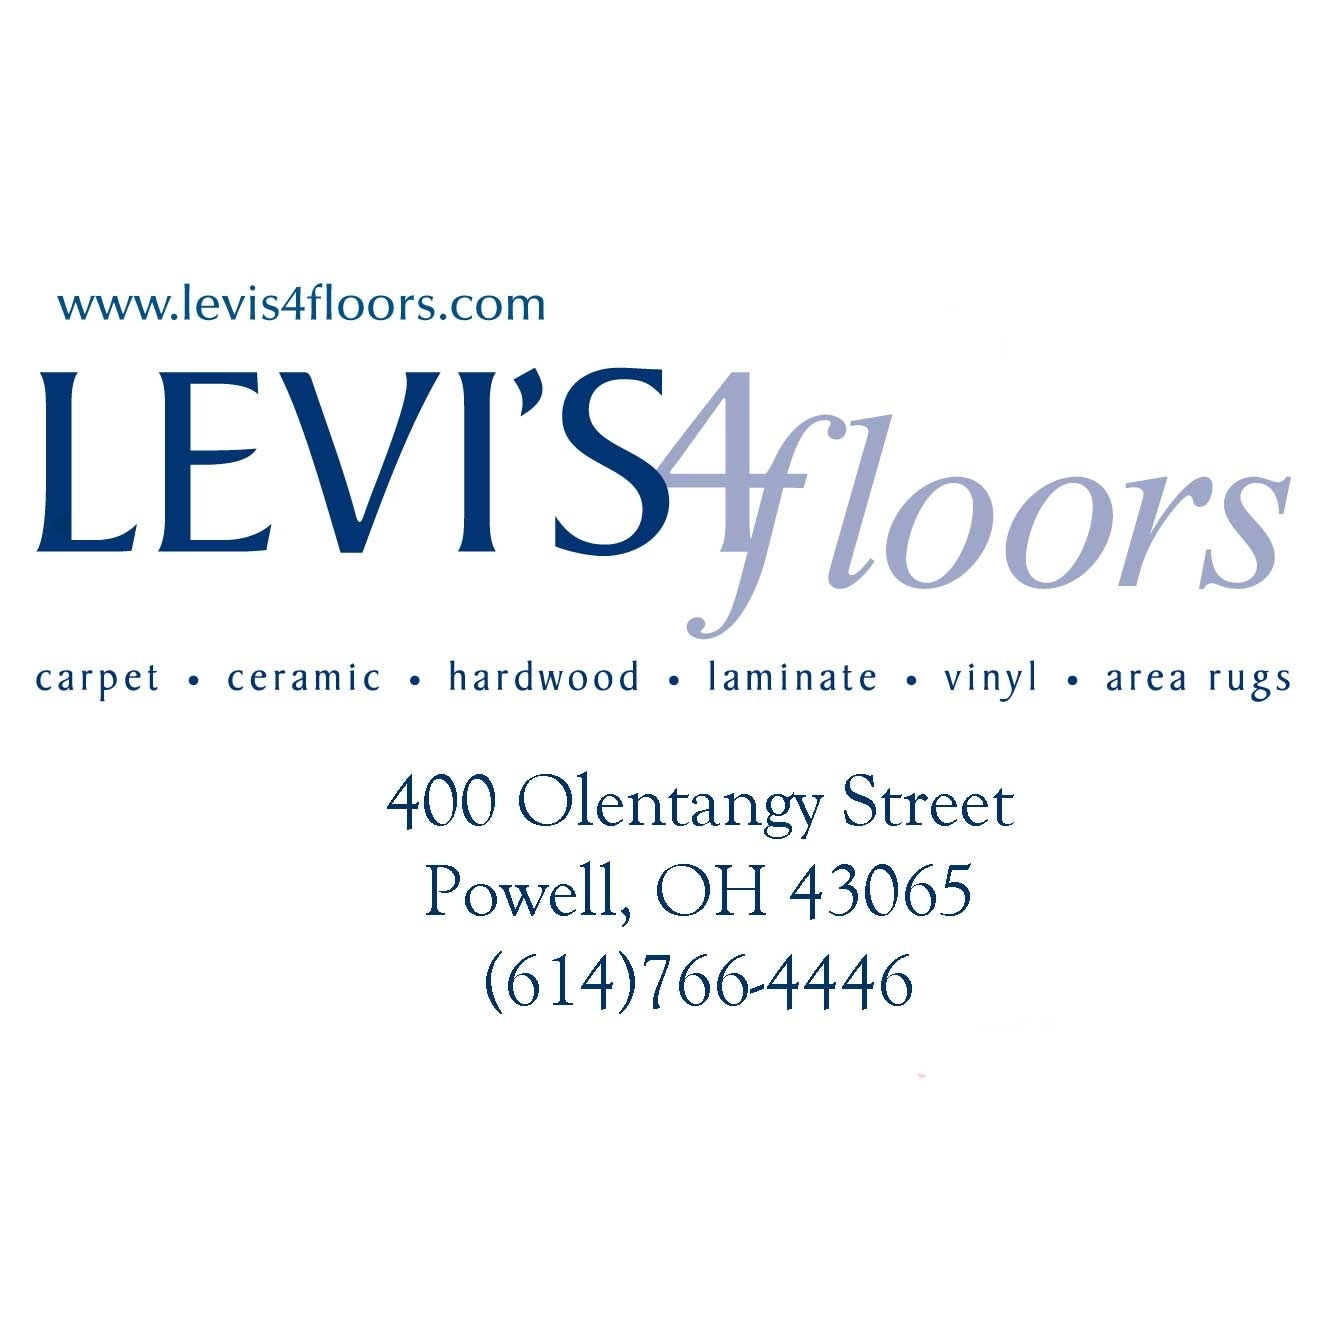 Levi's 4 Floors - Powell, OH - Carpet & Floor Coverings